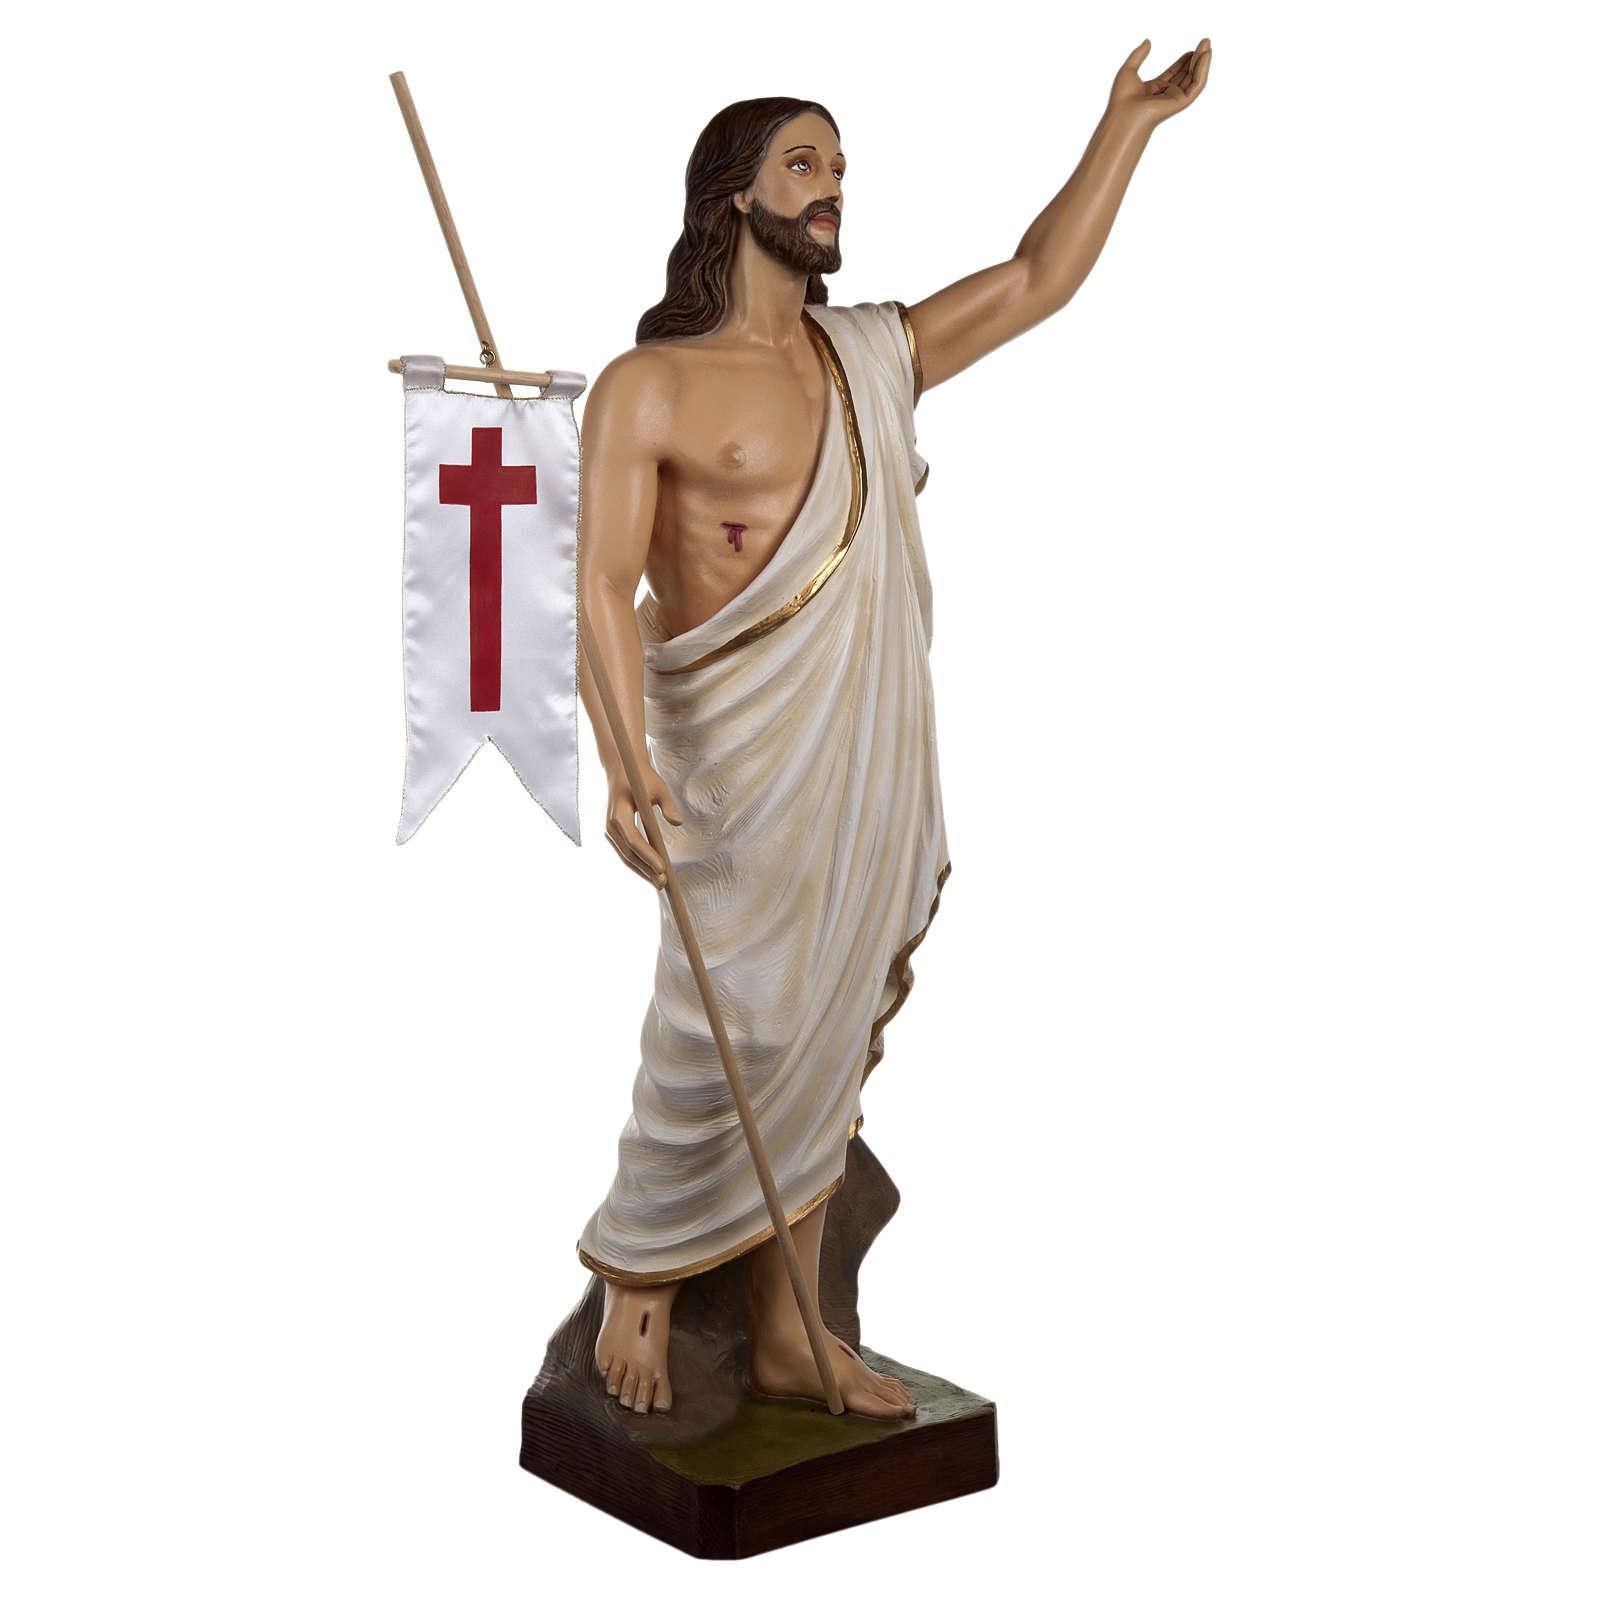 Auferstandener Christus 85cm Fiberglas AUSSENGEBRAUCH 4